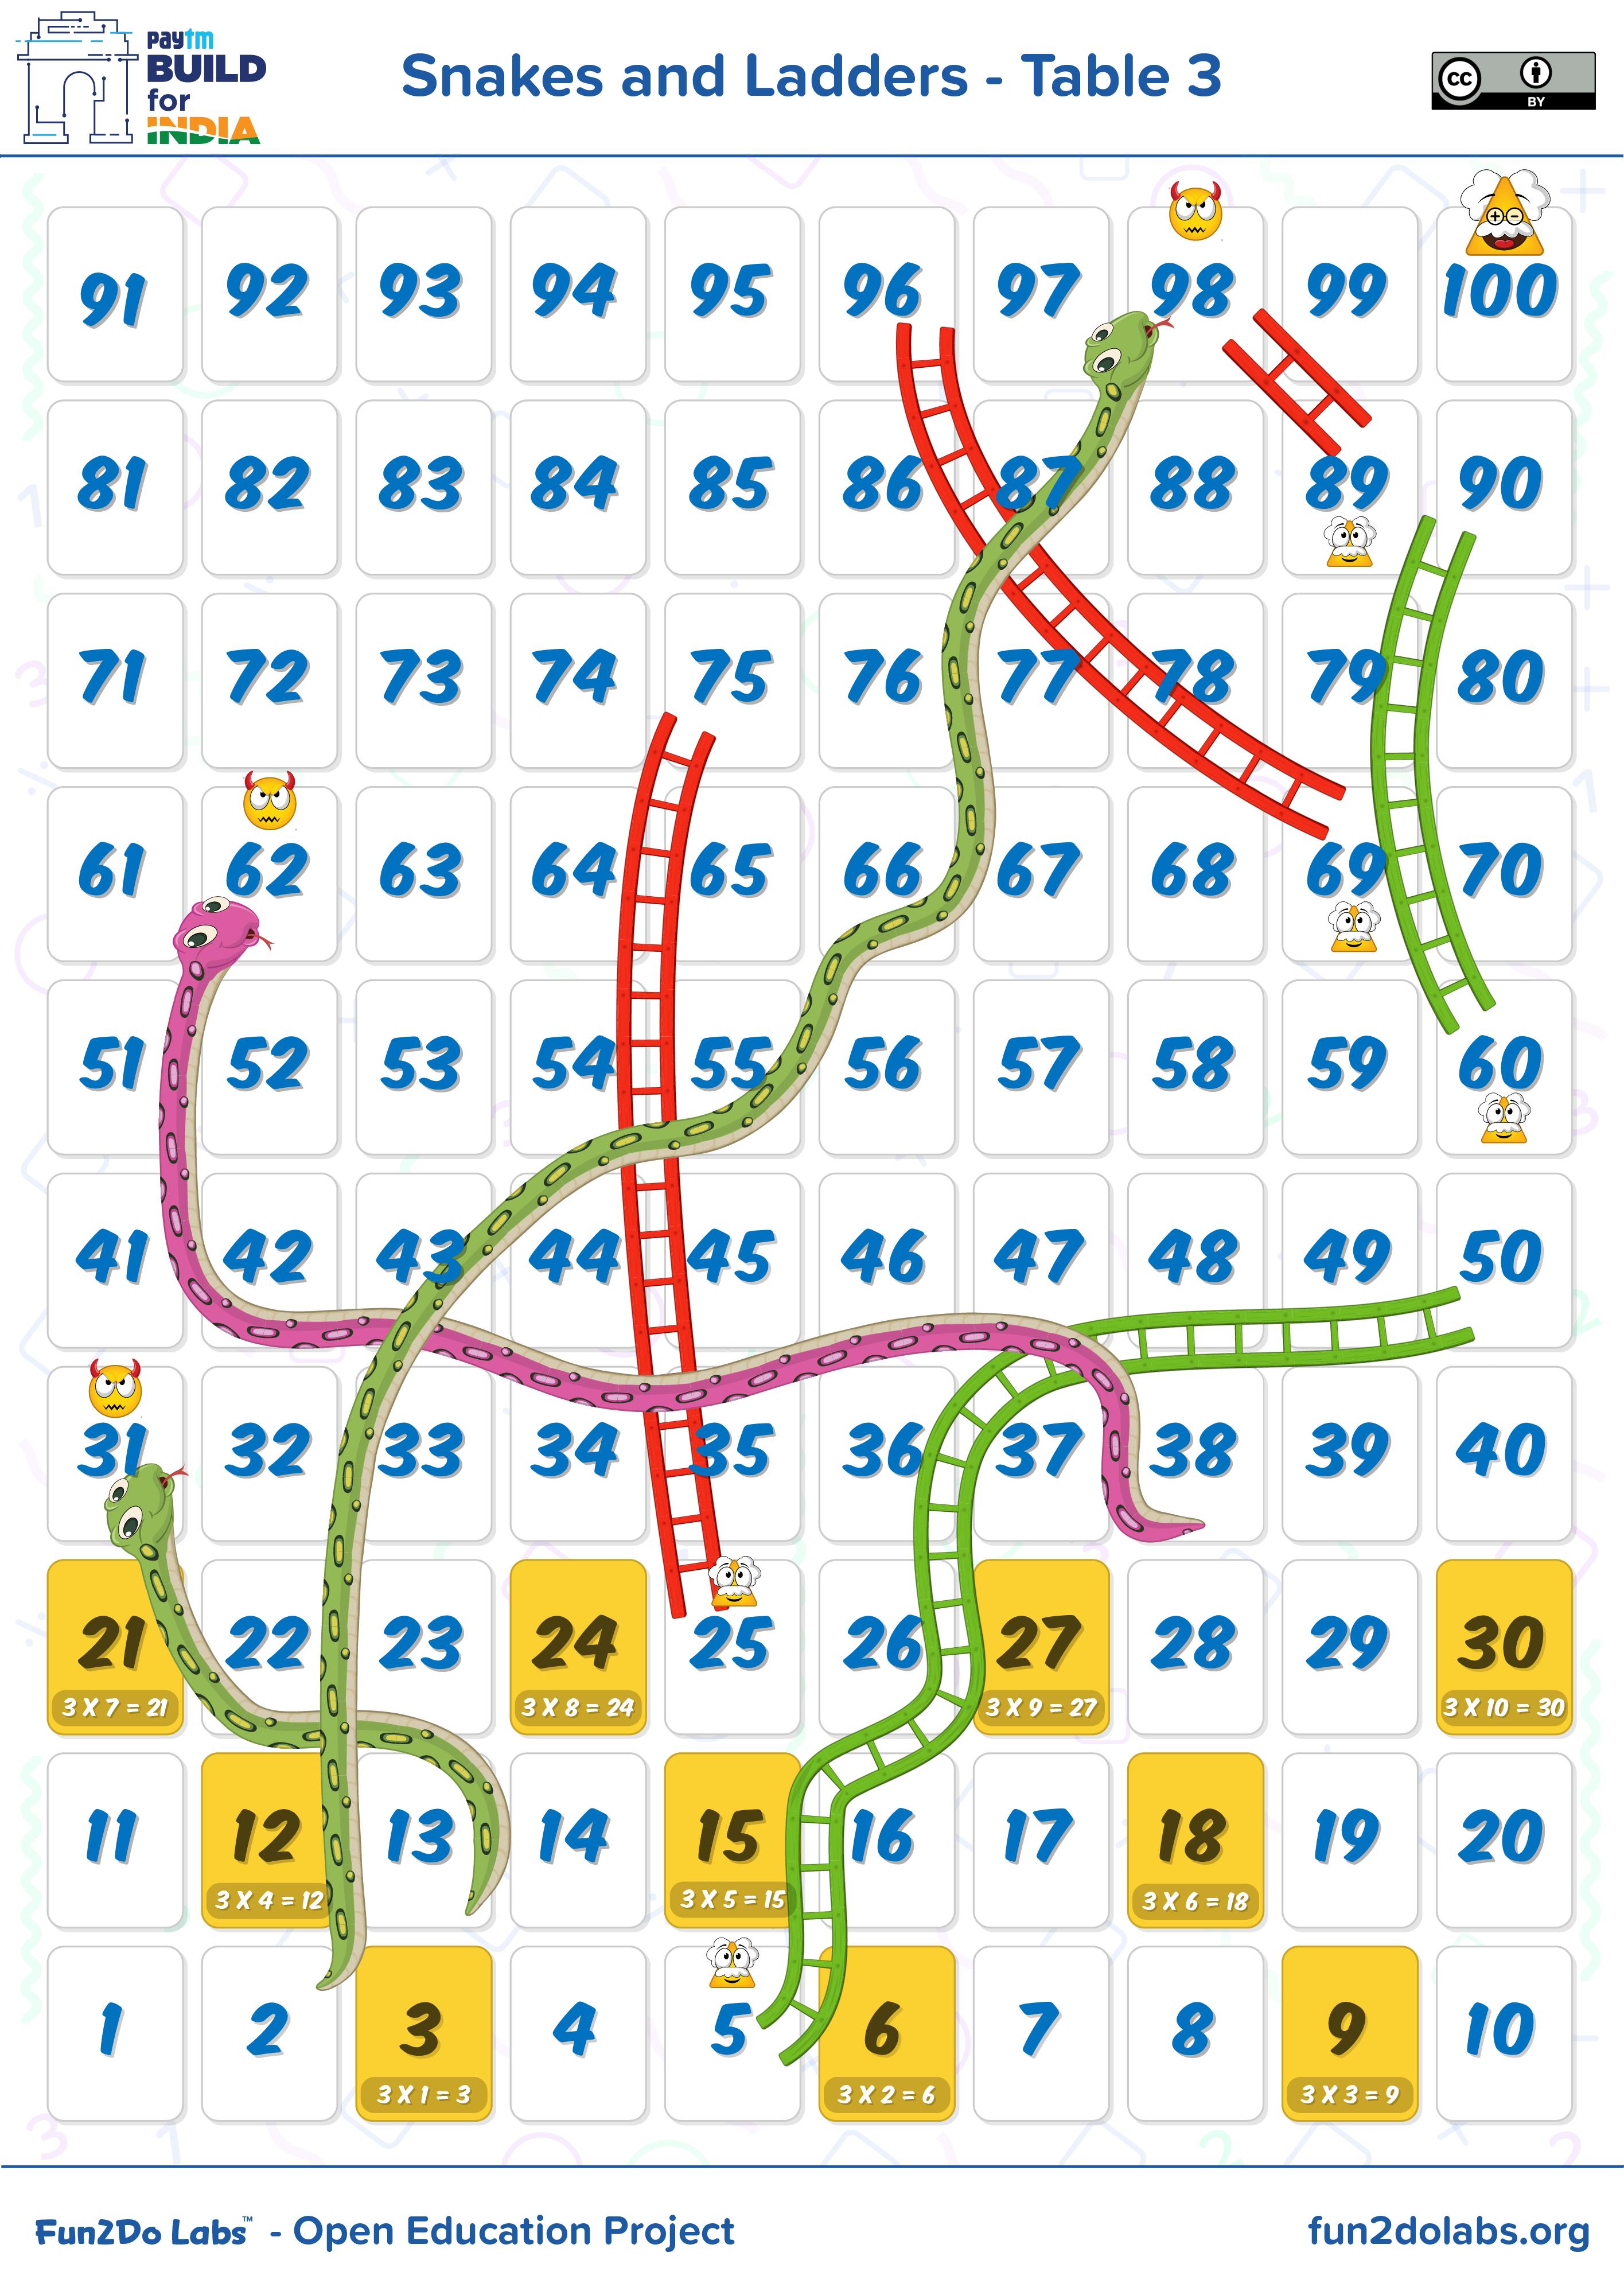 Multiplication Table Games How To Teach Math Table To Kids How To Teach Times Tables To Kids Multiplication Table Snakes And Ladders Teaching Multiplication